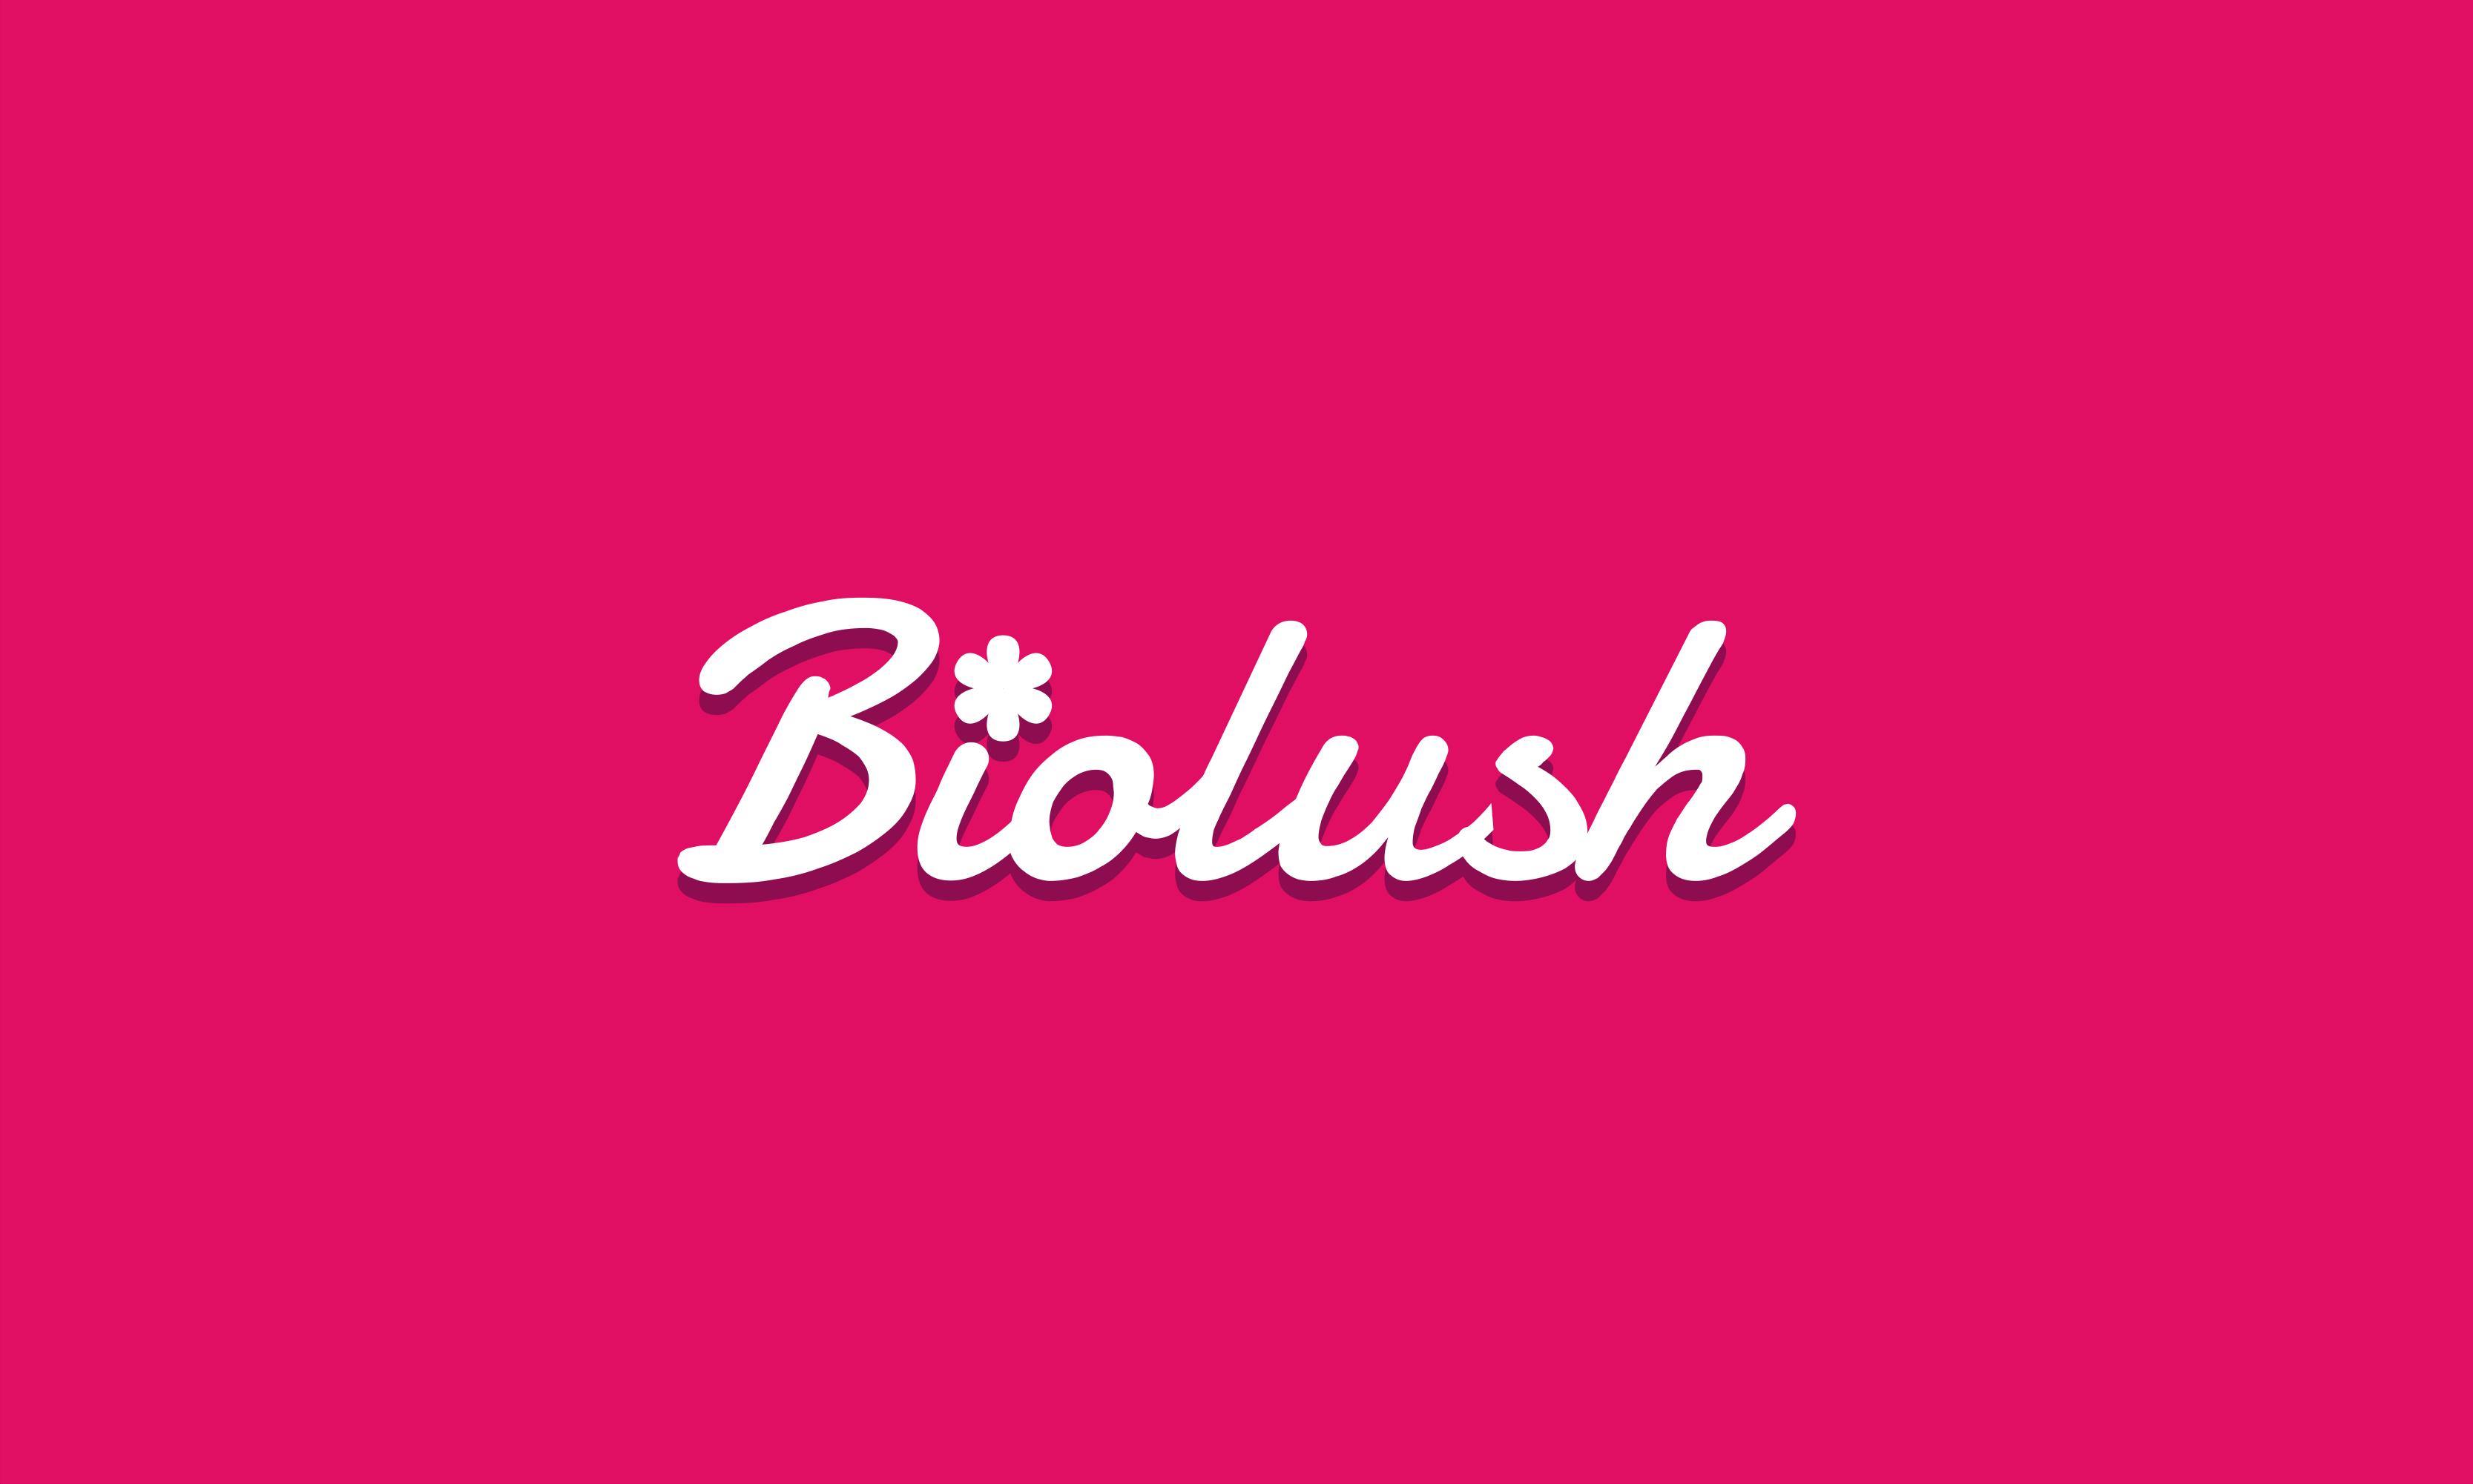 Biolush